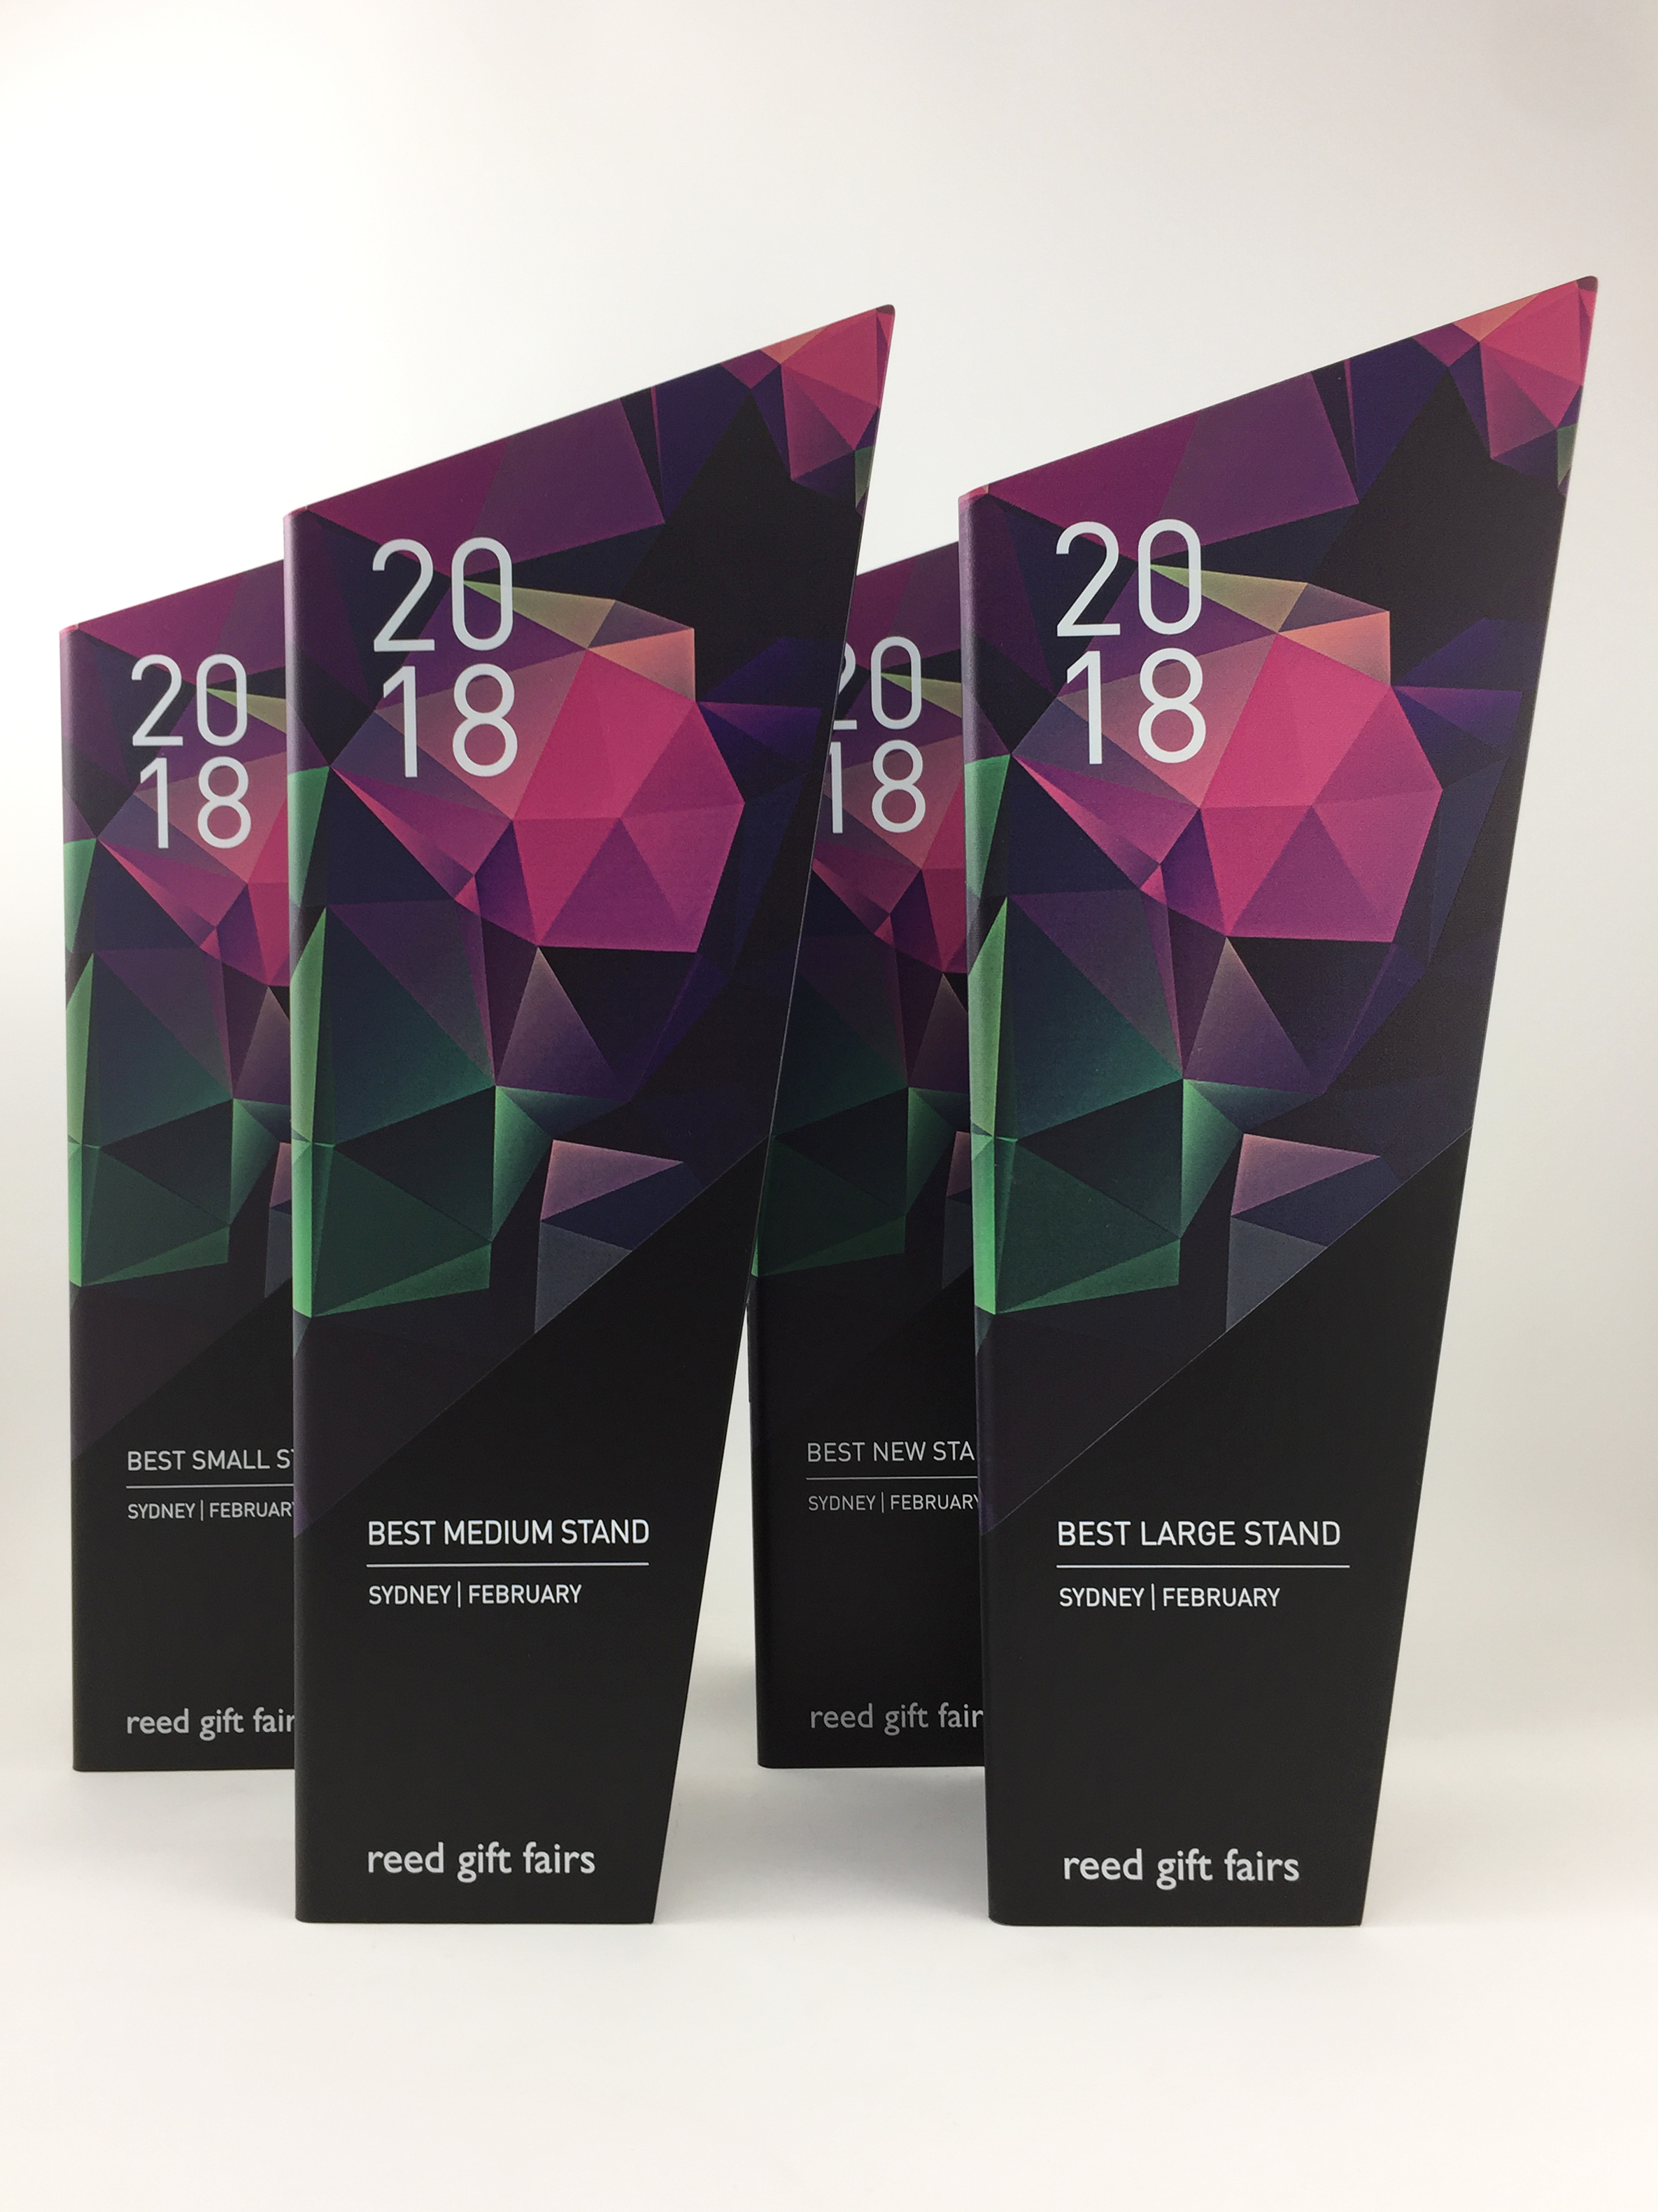 reed-gift-fairs-graphic-print-aluminium-trophy-award-06.jpg